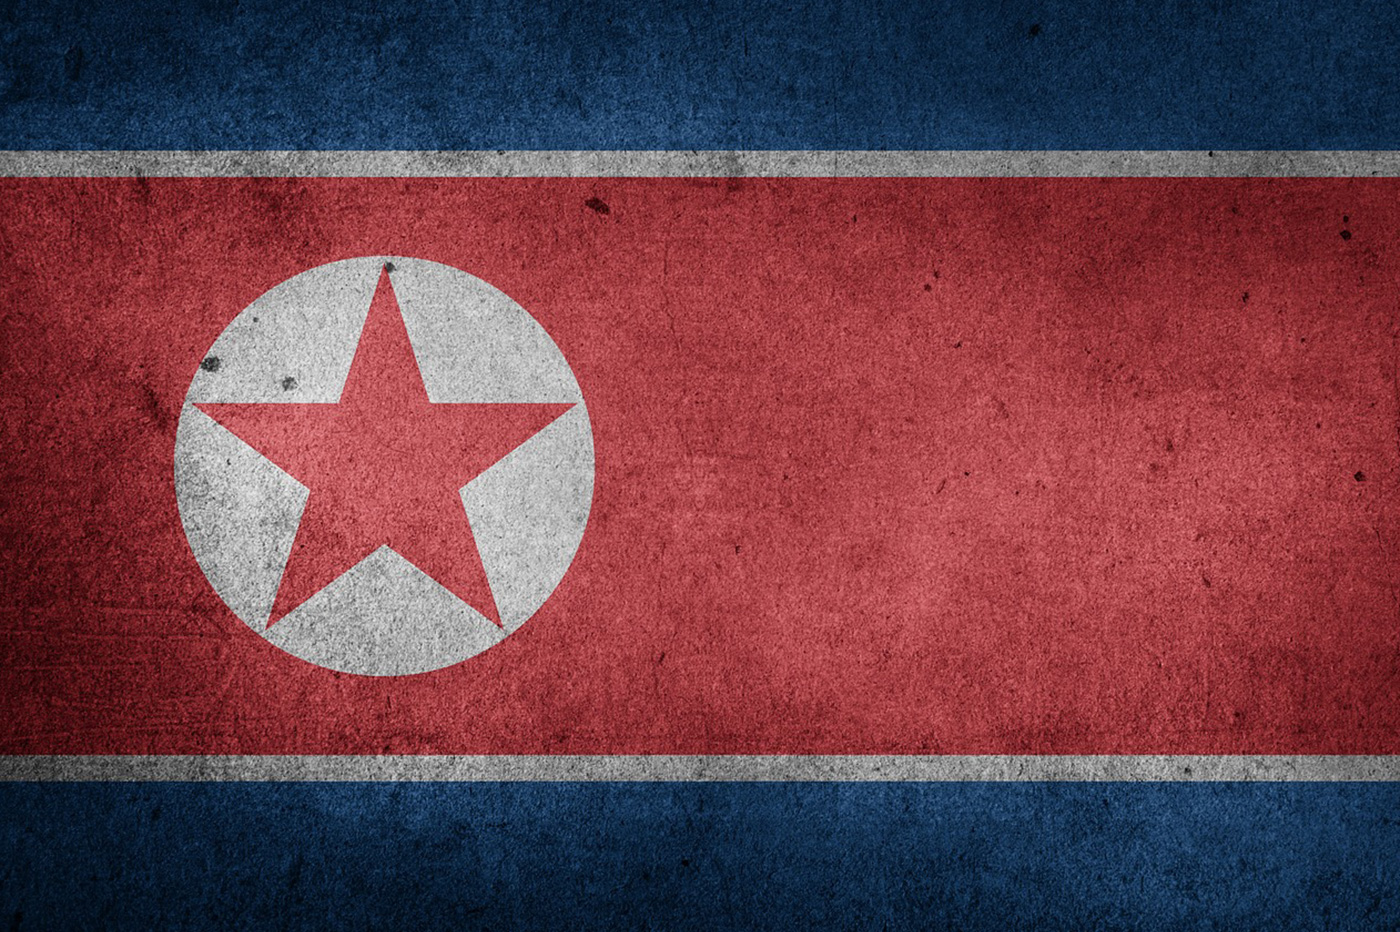 Corée du Nord cyberattaques